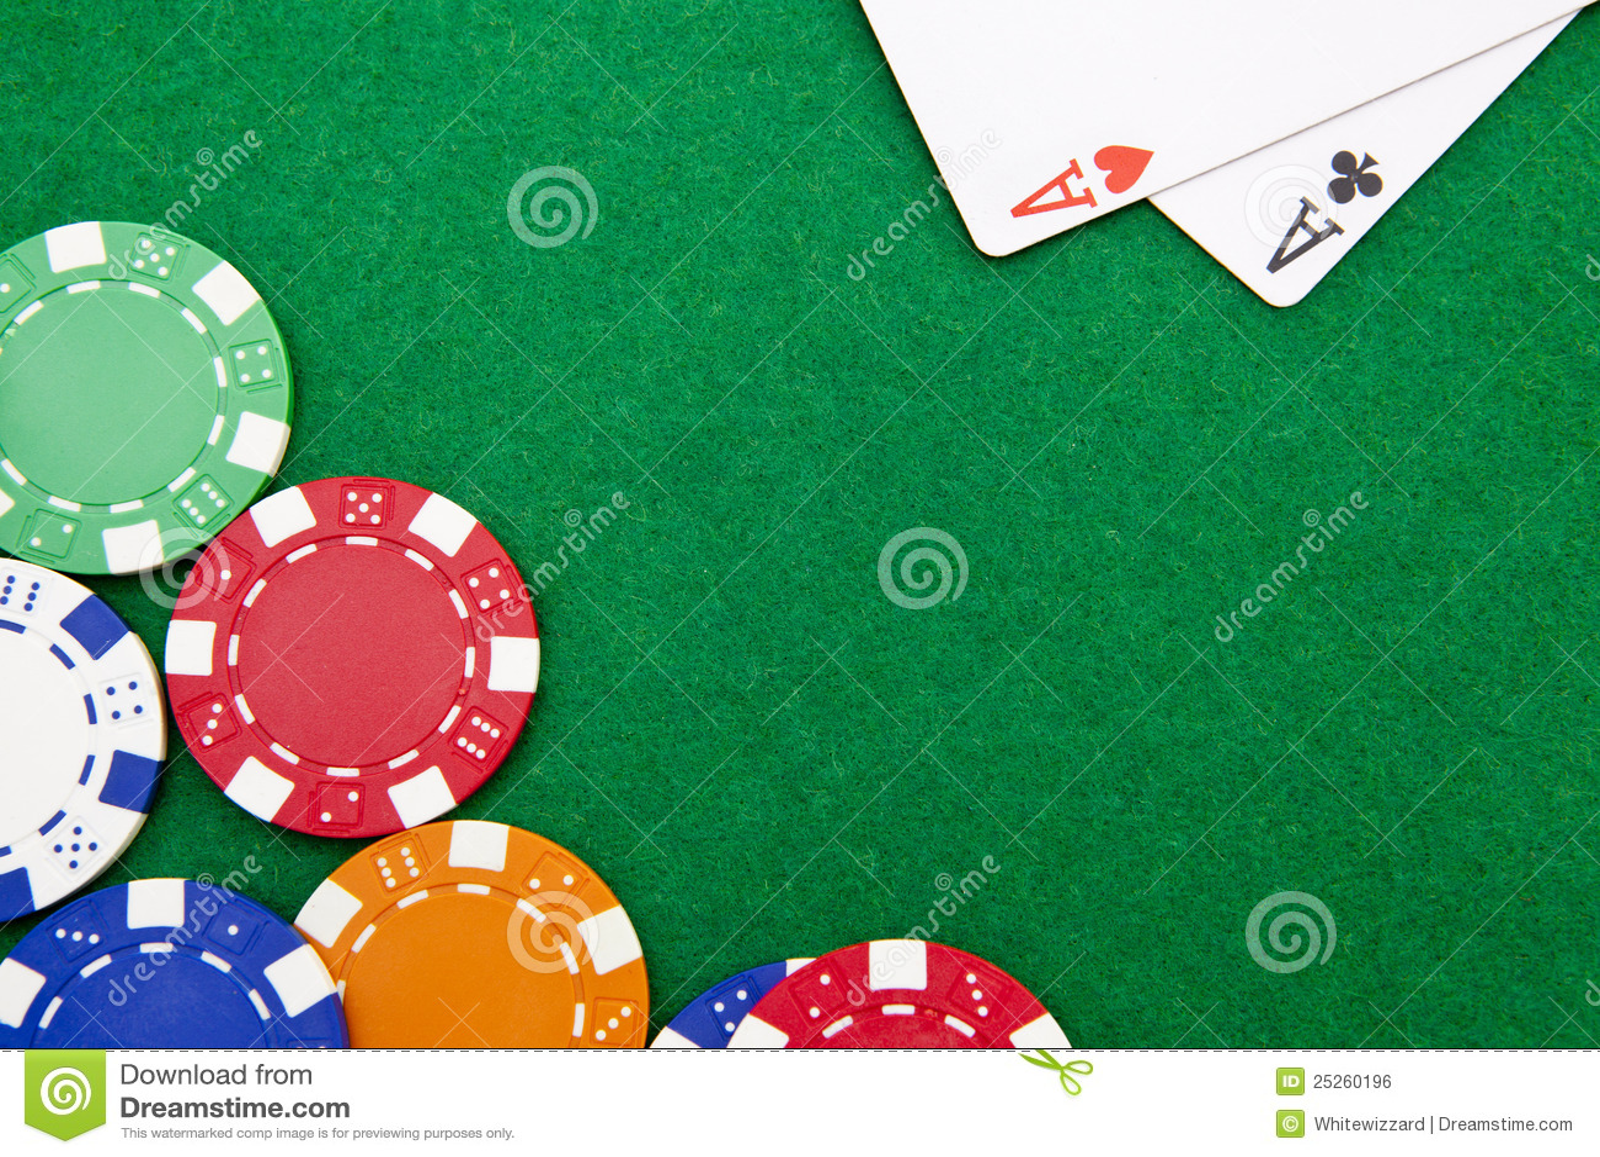 Seoul casino texas holdem